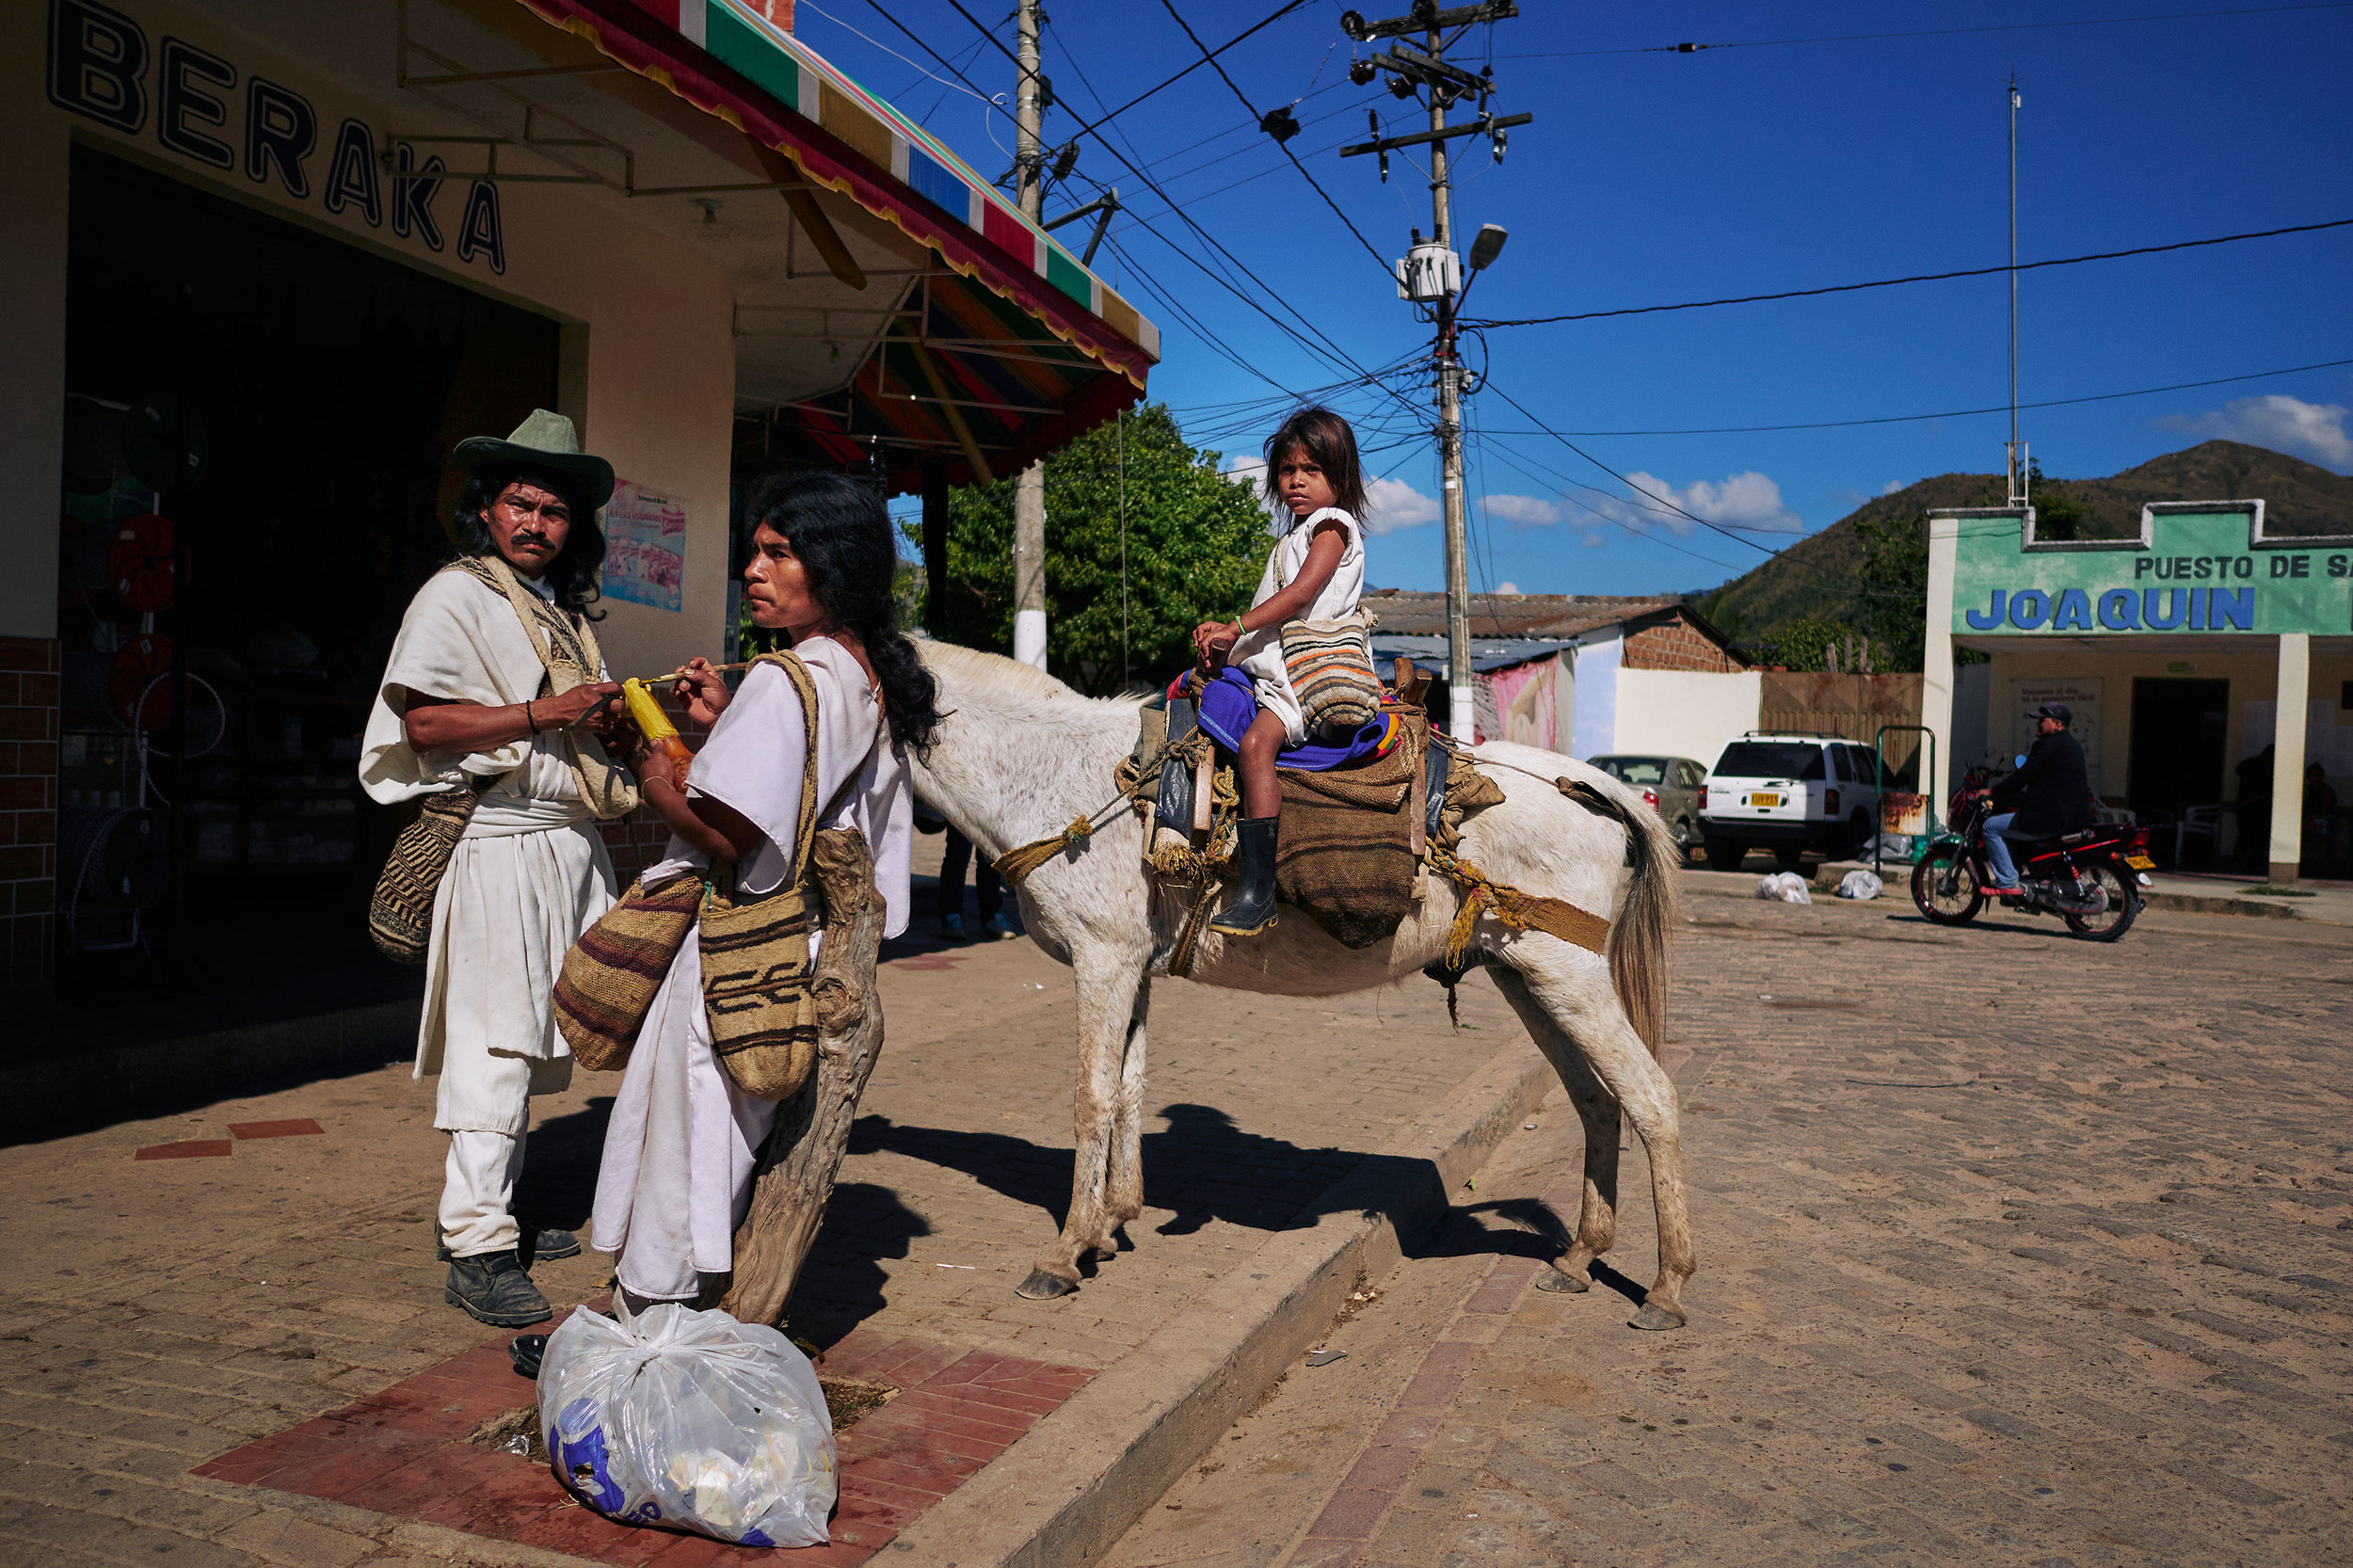 Colombia-travel-Pueblo-Bello-street-scene